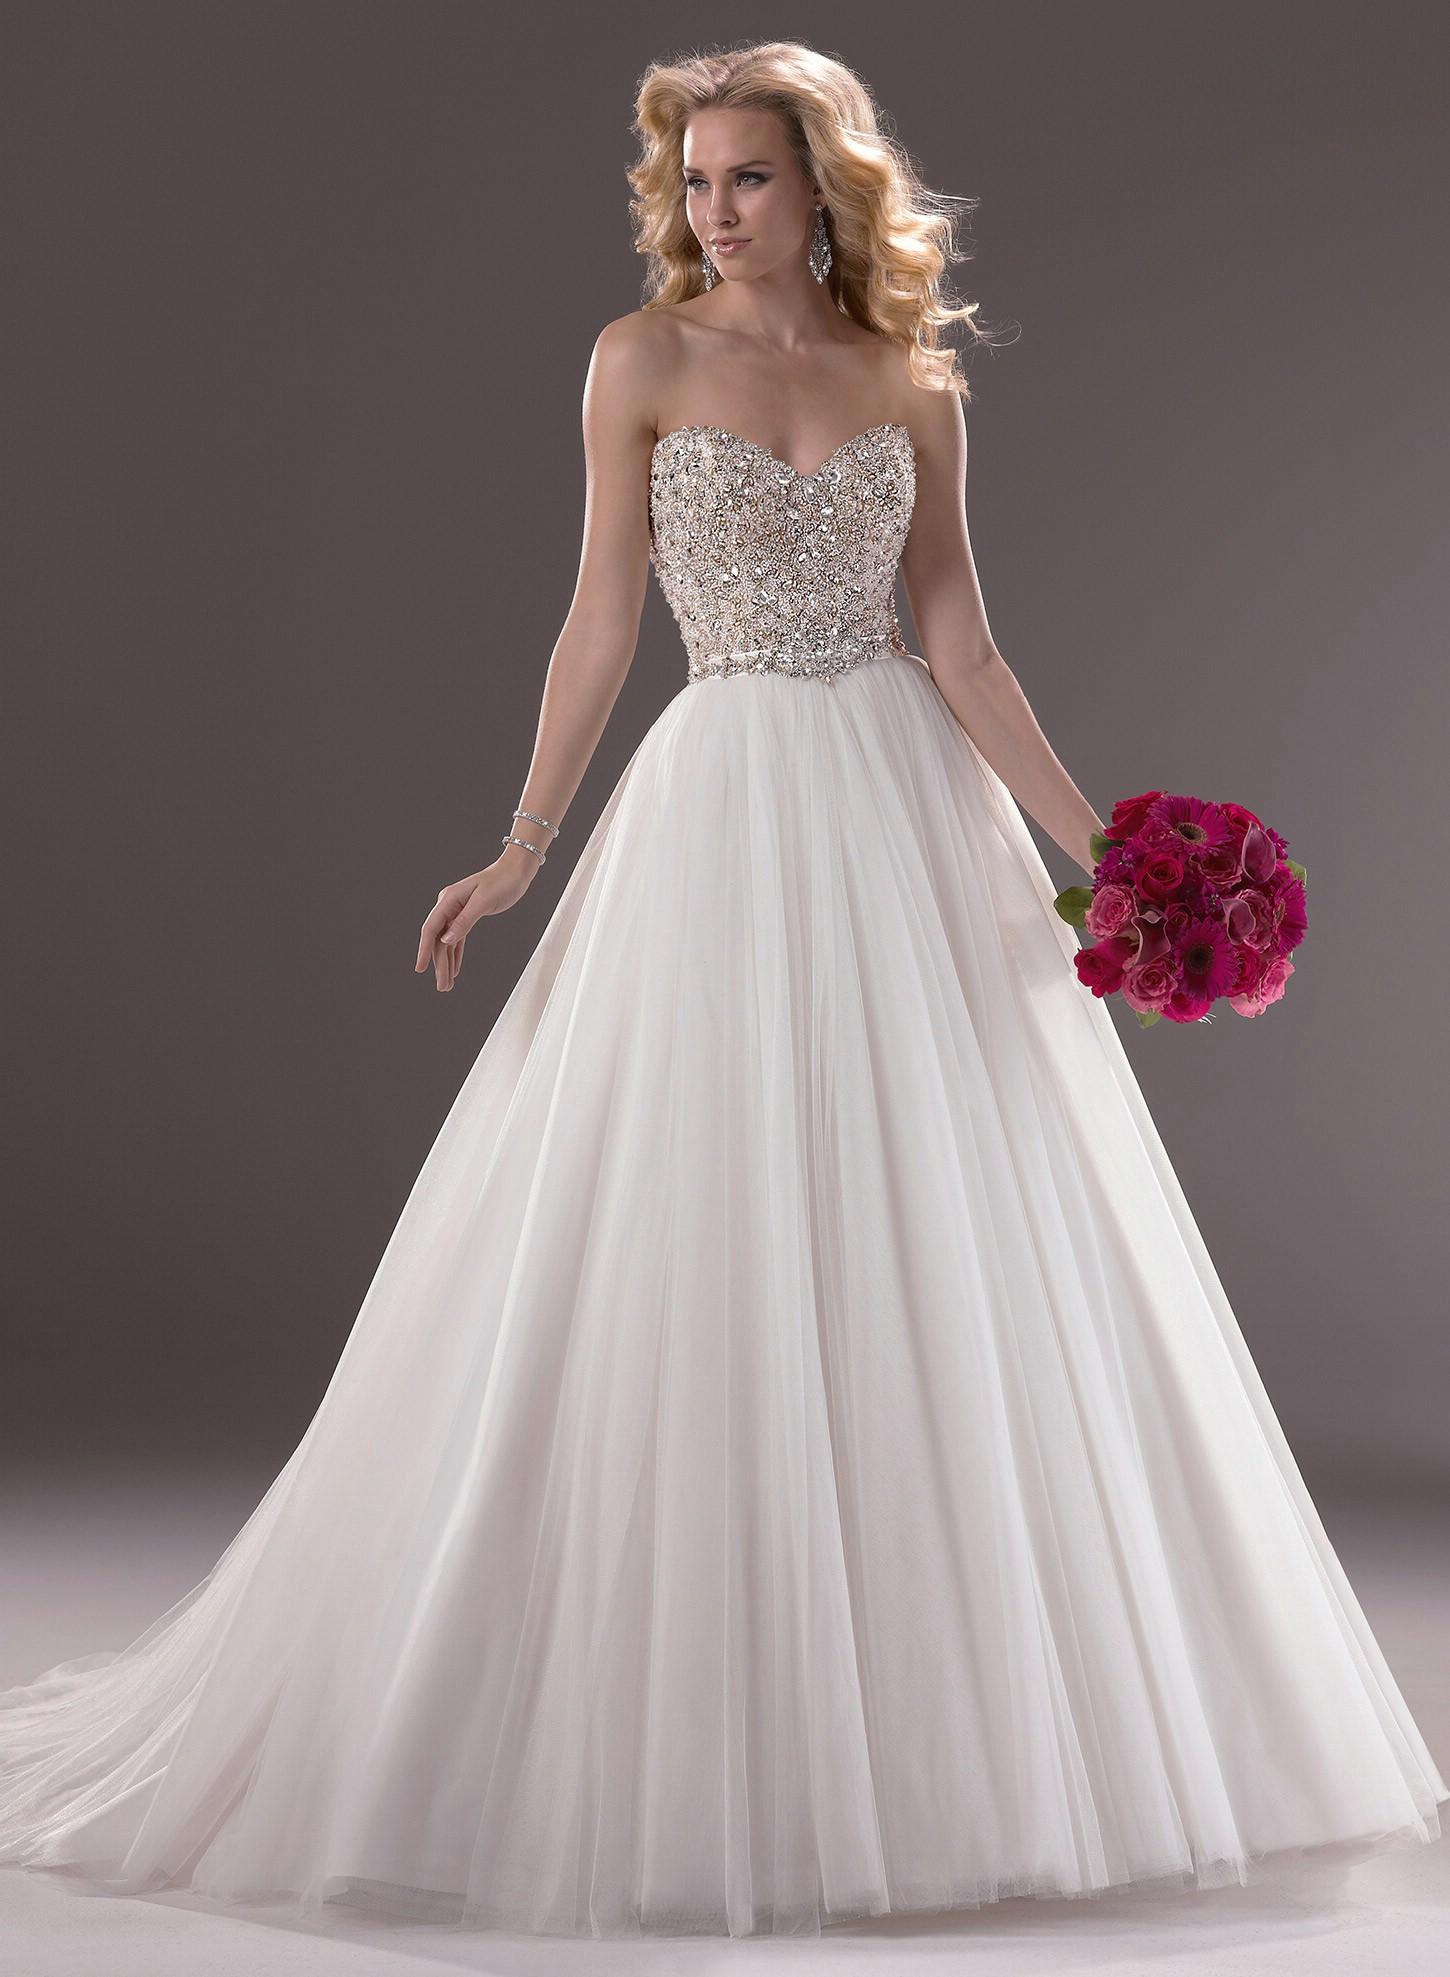 Maggie Sottero Wedding Dresses [Esme] at BestBridalPrices.com on Wanelo